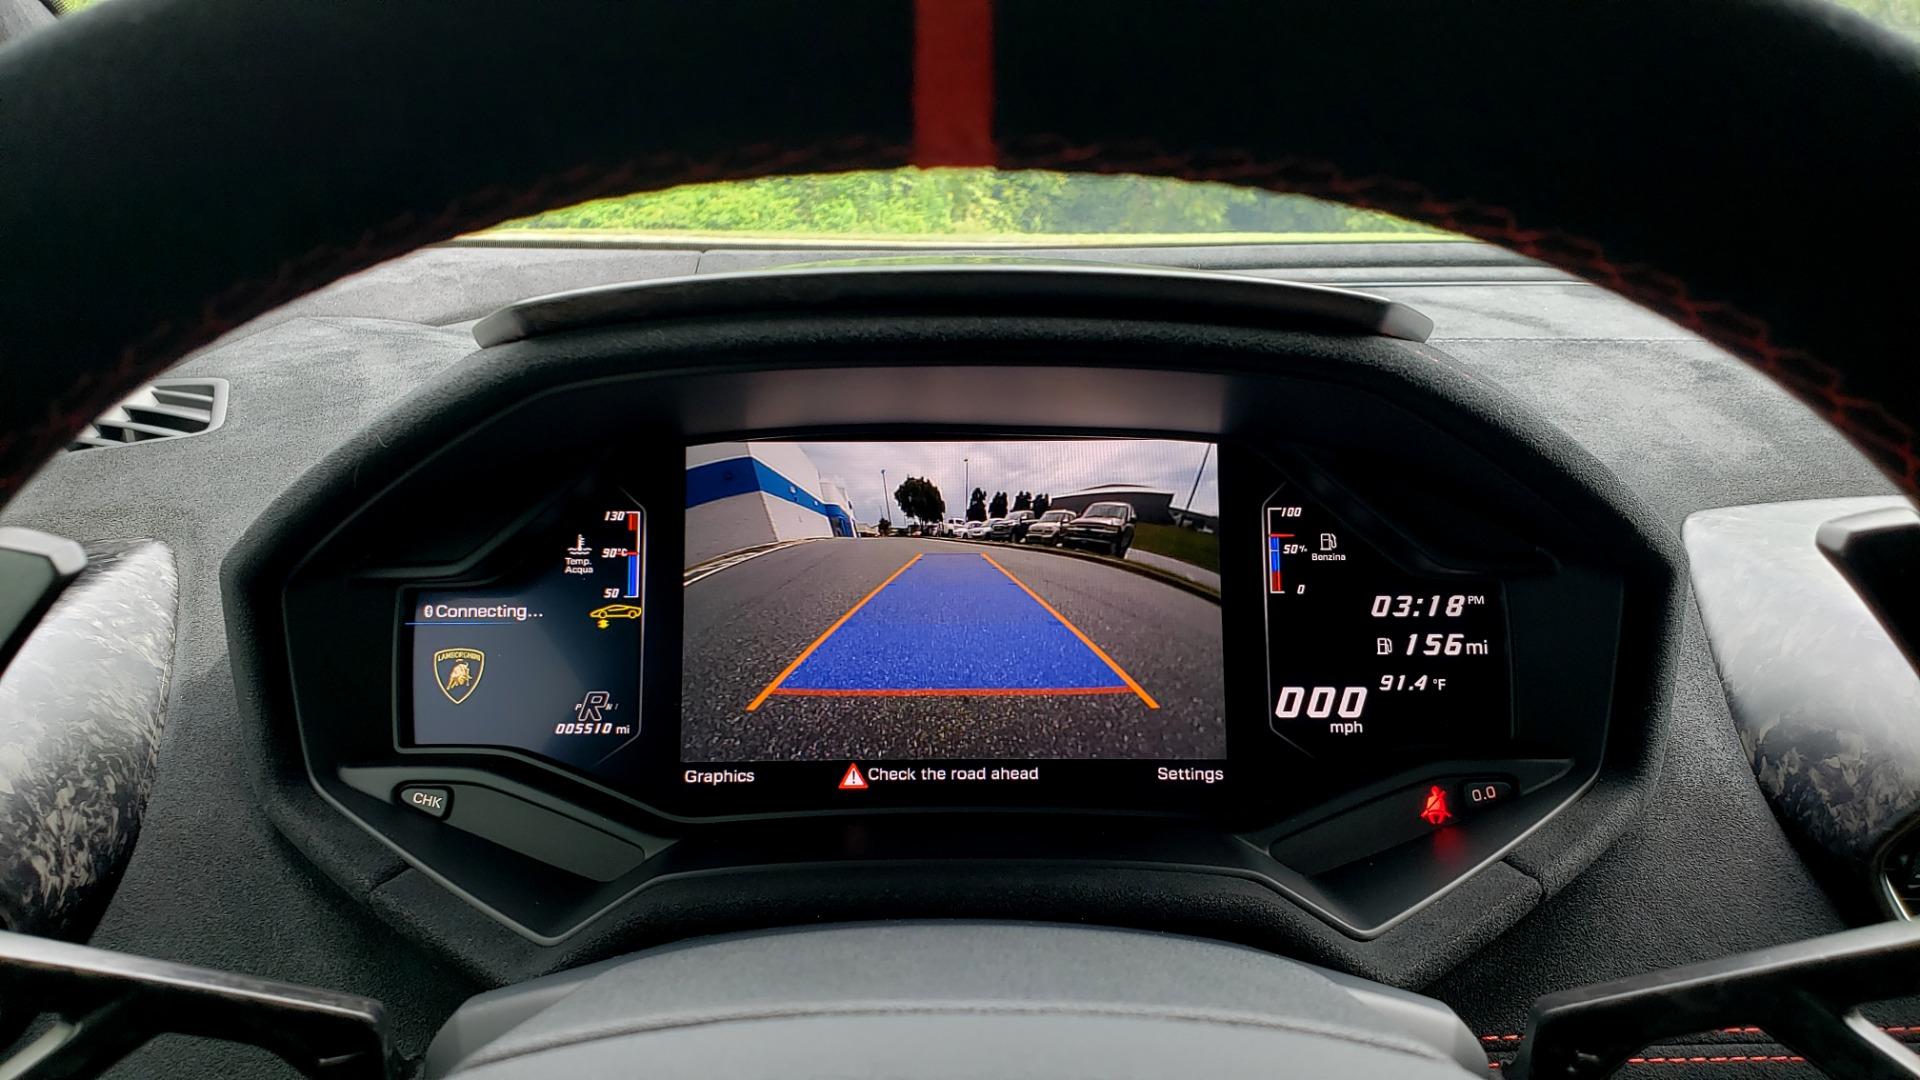 Used 2018 Lamborghini HURACAN PERFORMANTE 5.2L V10 / 630HP / 7-SPD AUTO / AWD / NAV / PREM SND for sale $269,995 at Formula Imports in Charlotte NC 28227 33